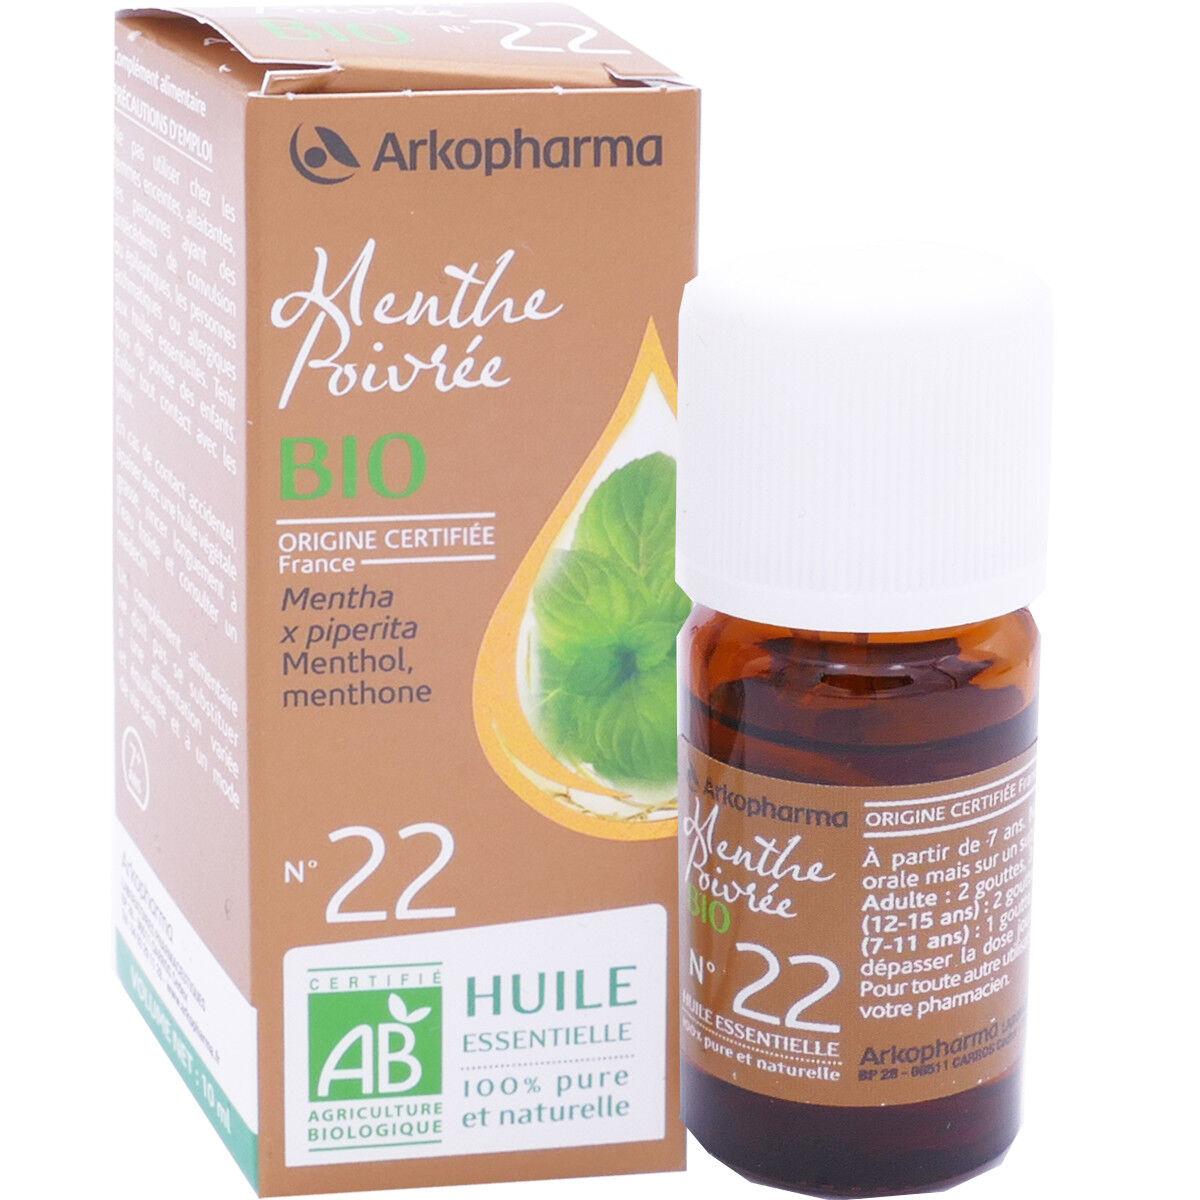 Arkopharma huile essentielle menthe poivree bio n°22 10 ml